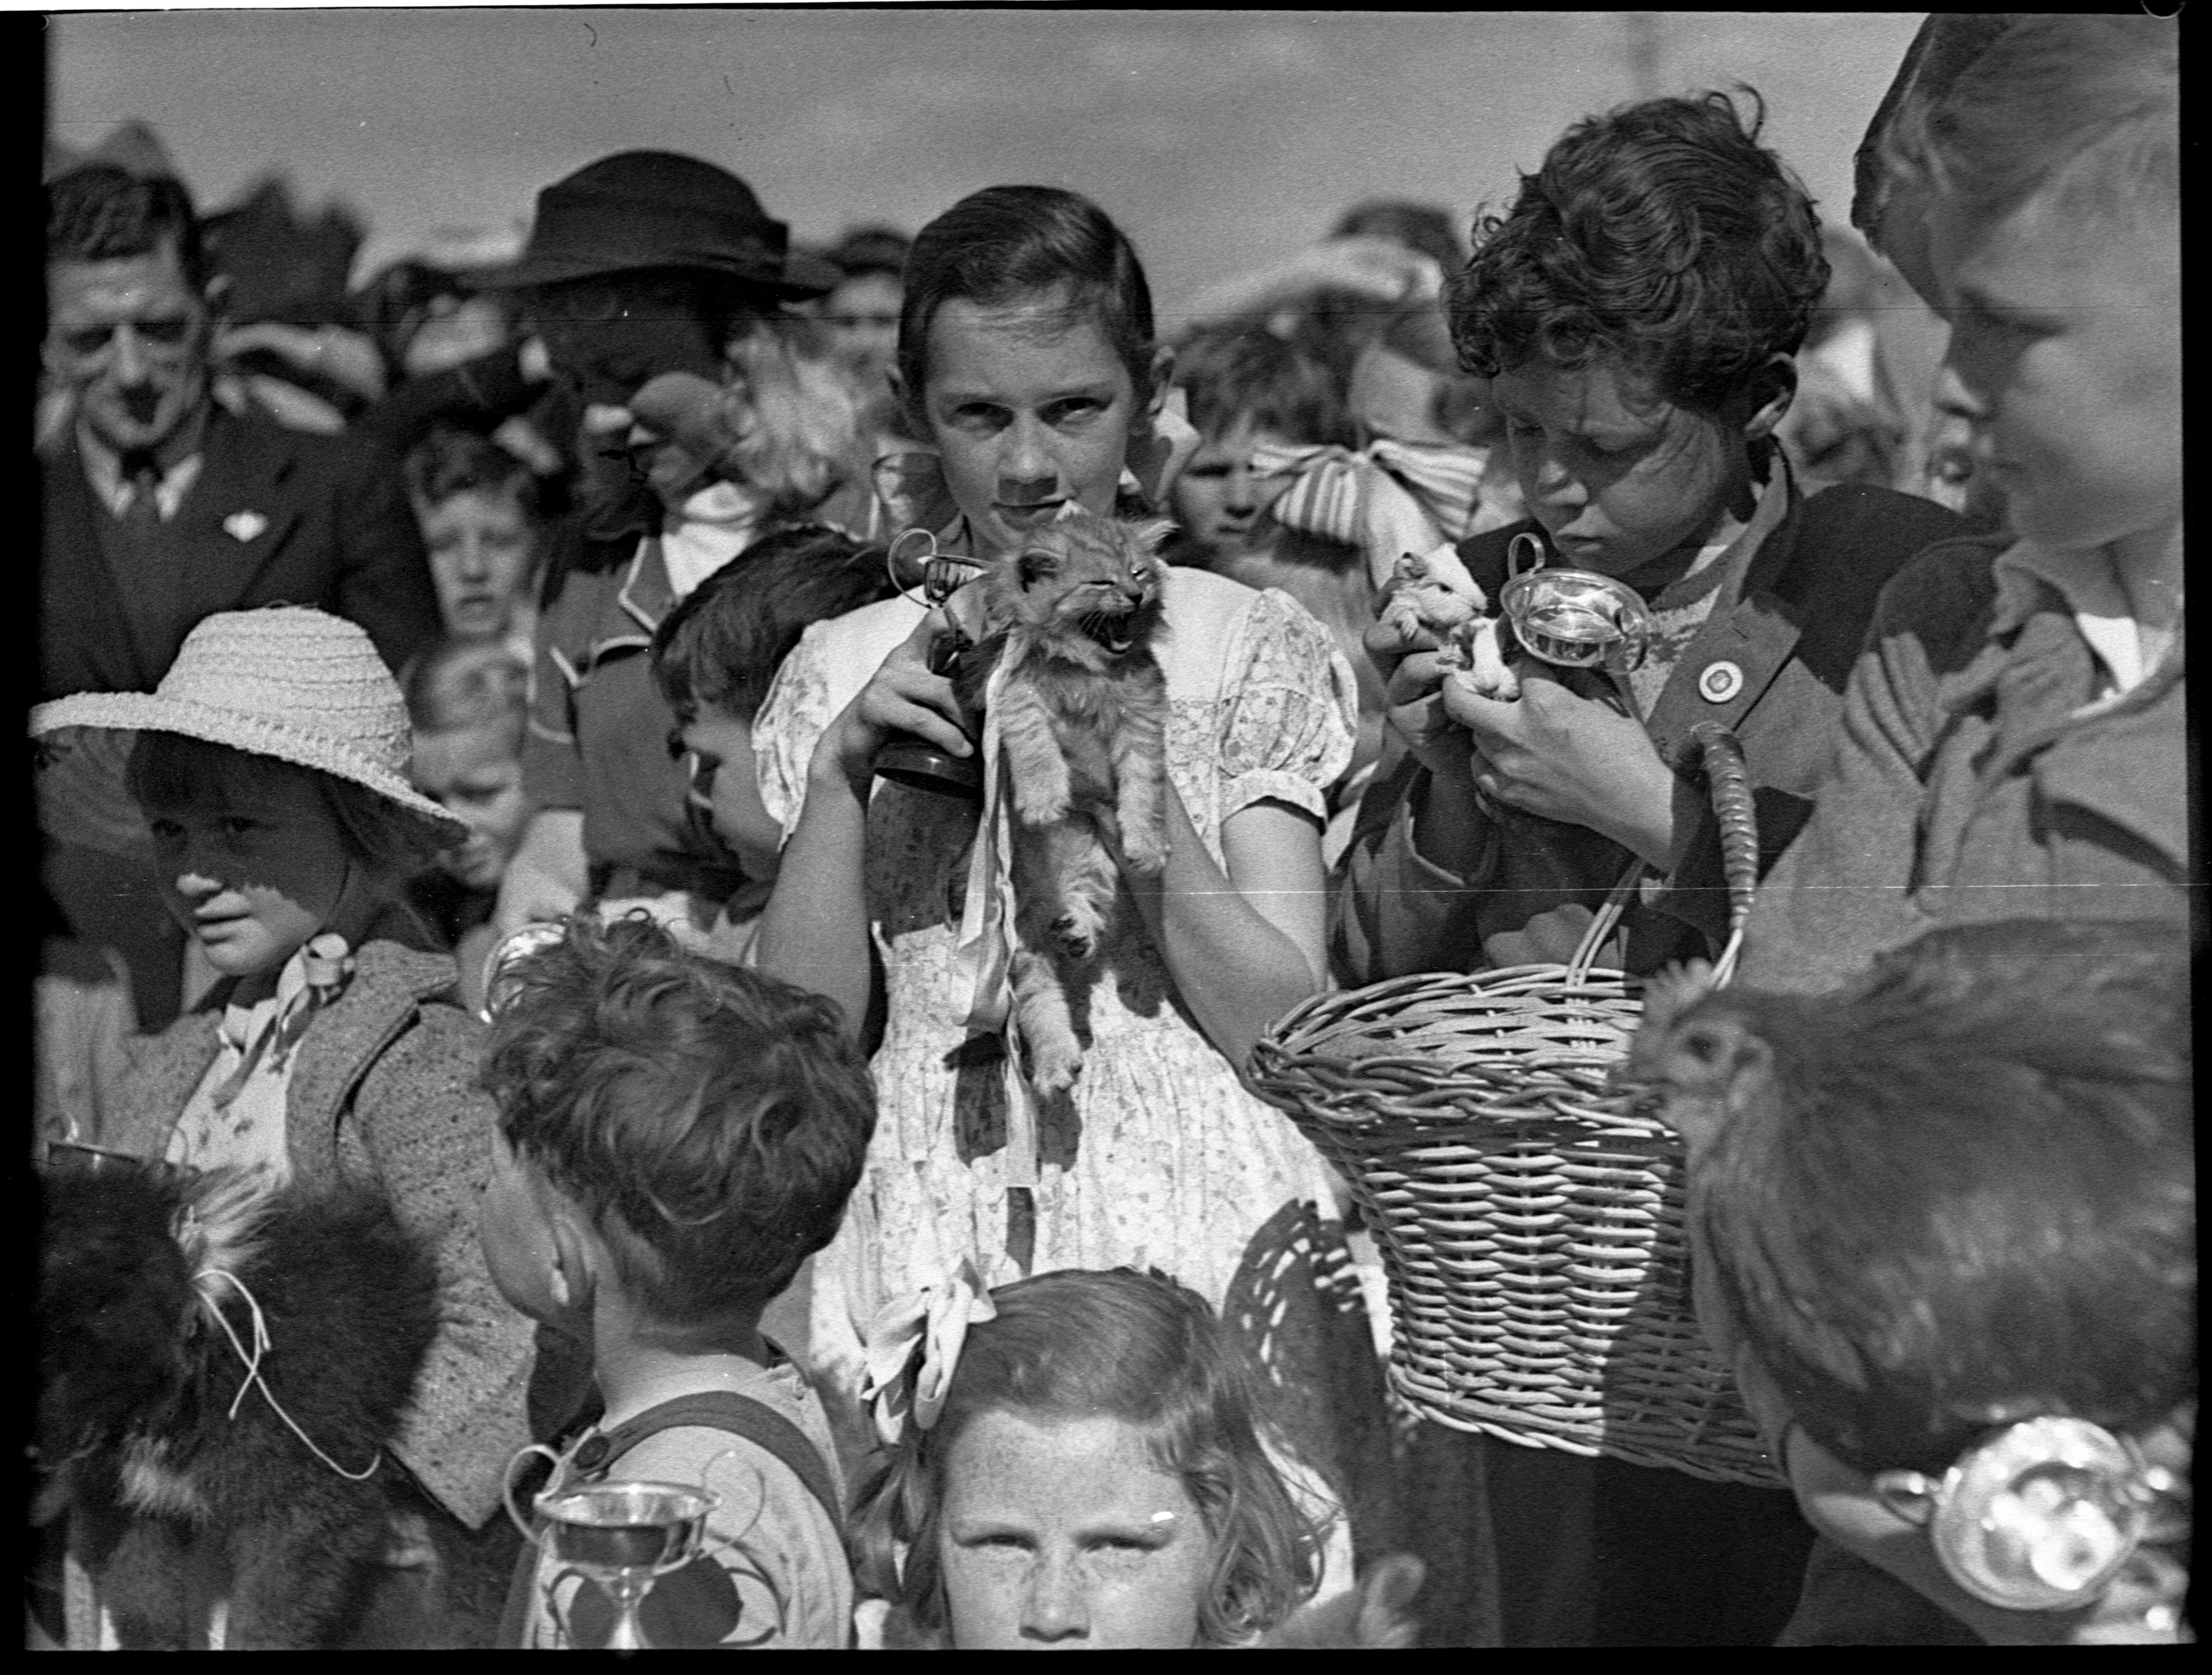 Eastwood pet parade, 5 September 1951, Sam Hood